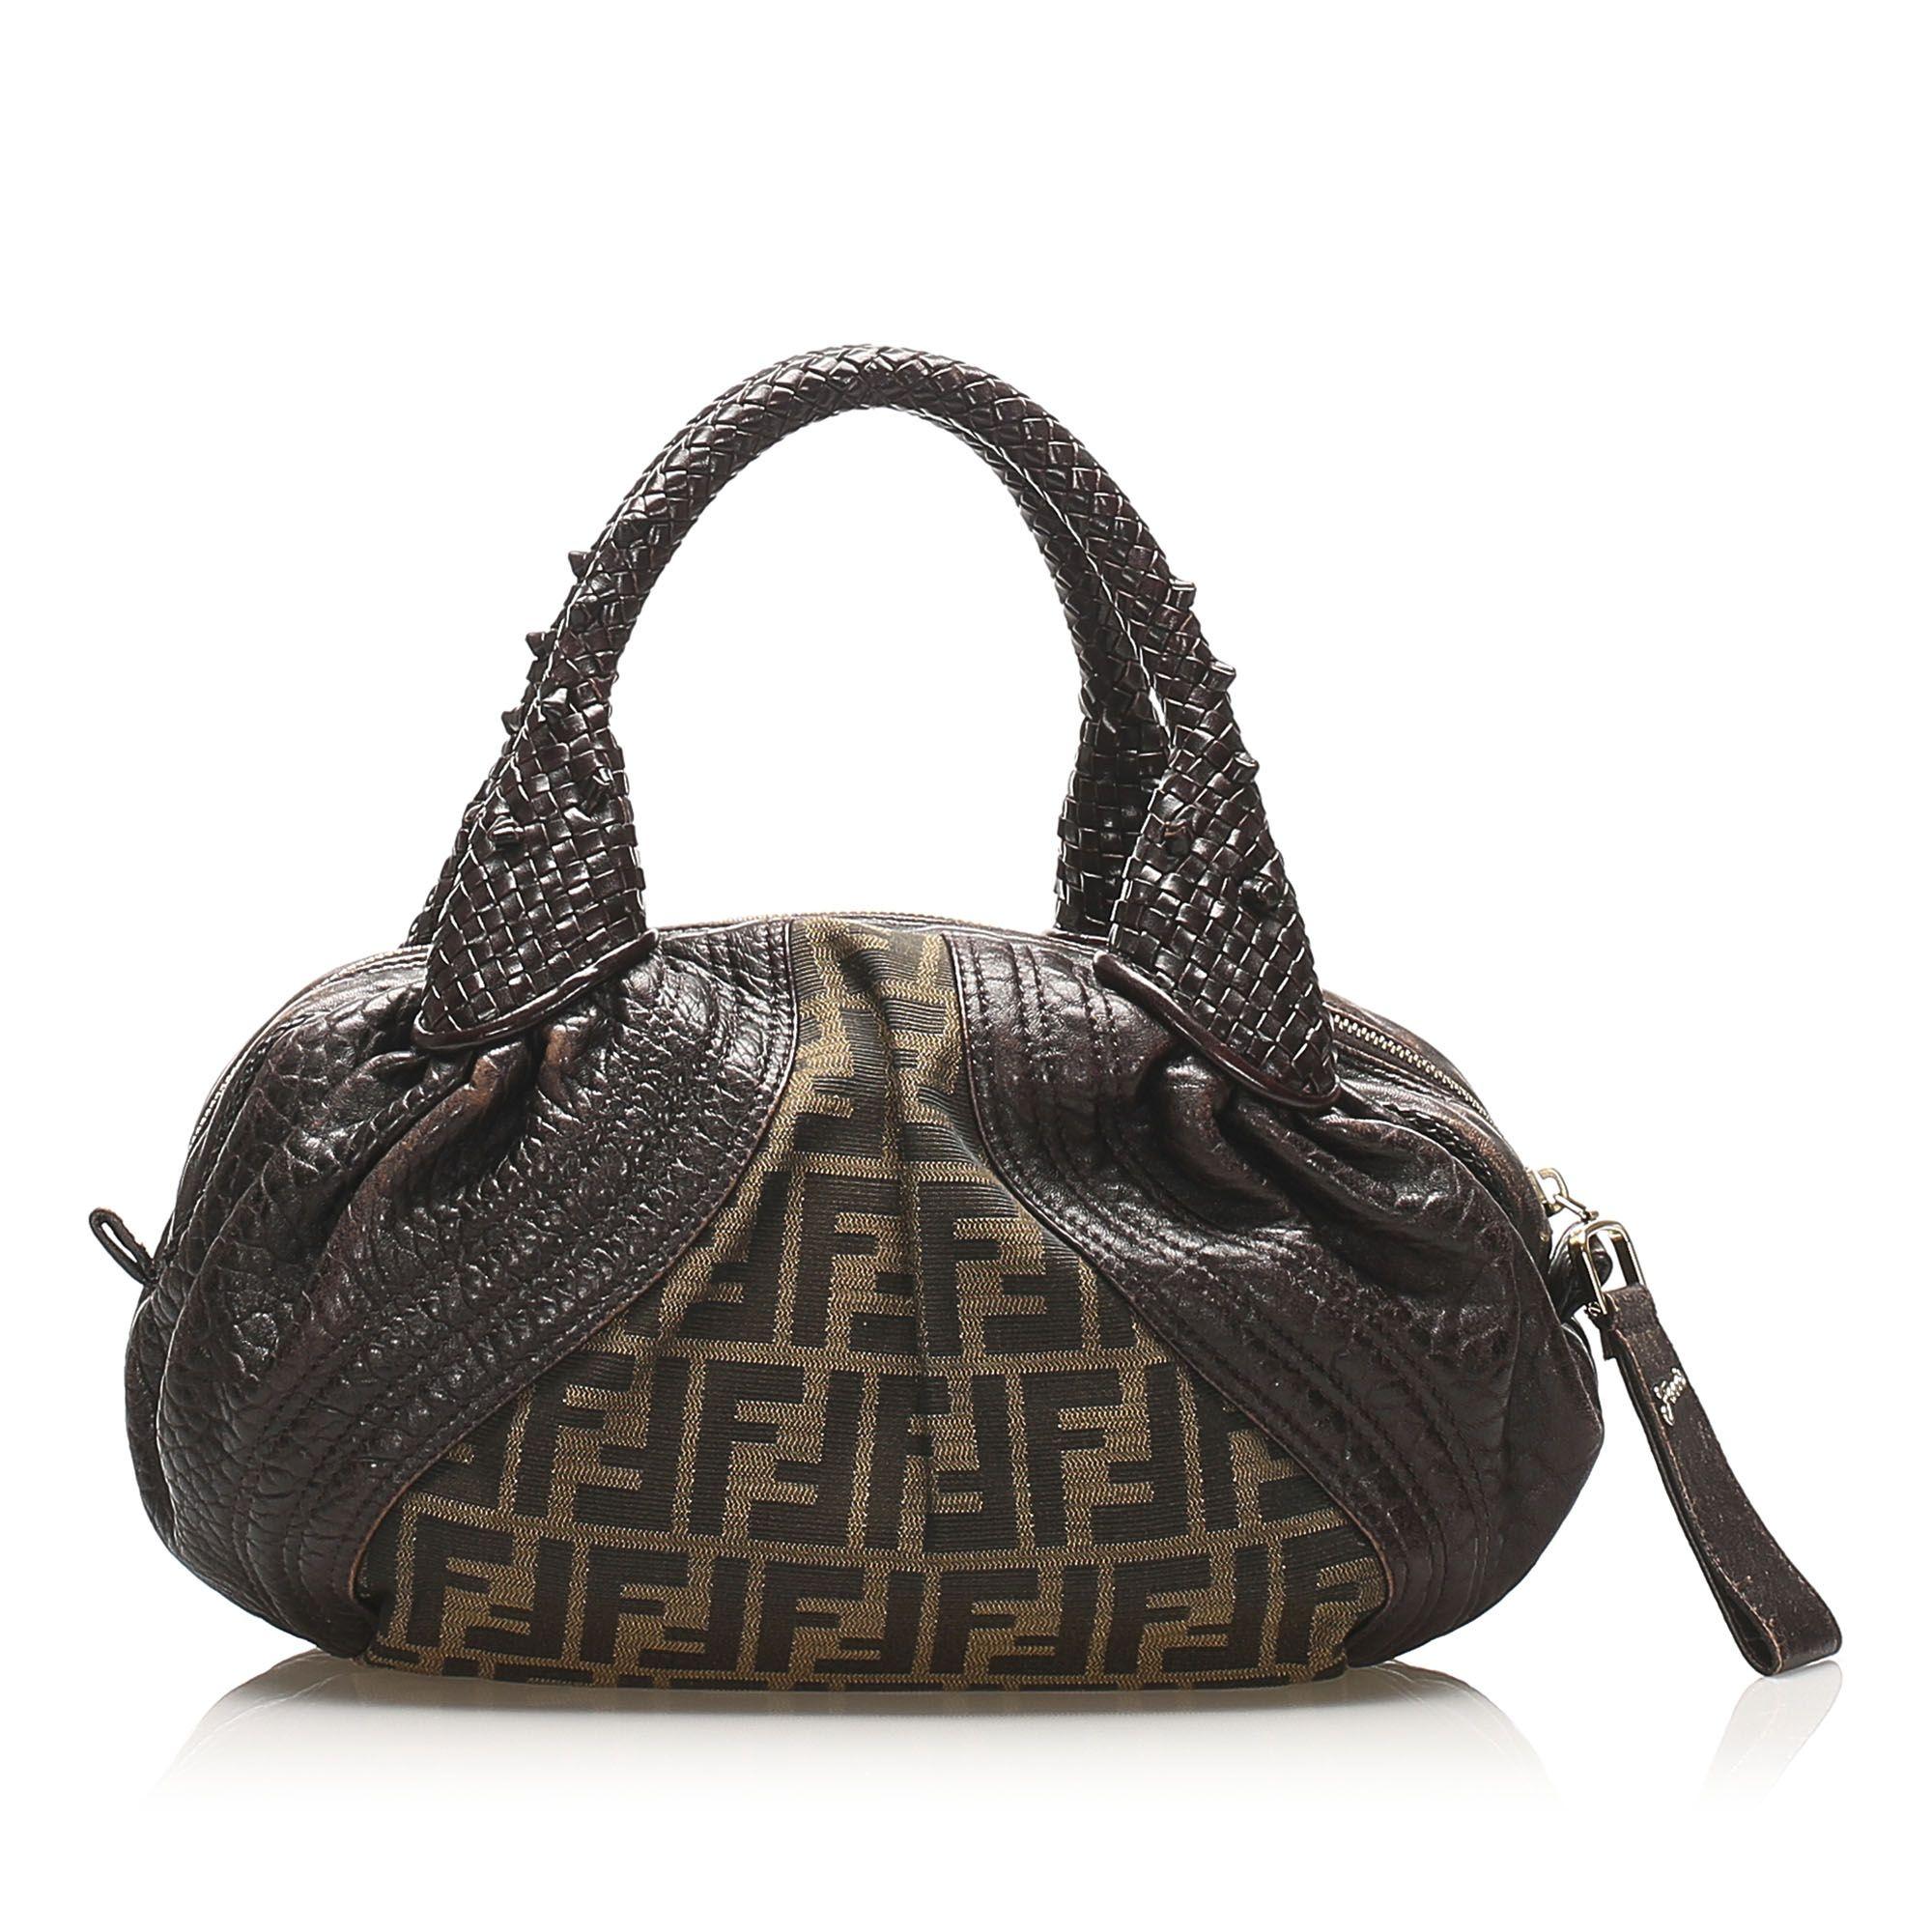 Vintage Fendi Zucca Spy Canvas Handbag Brown